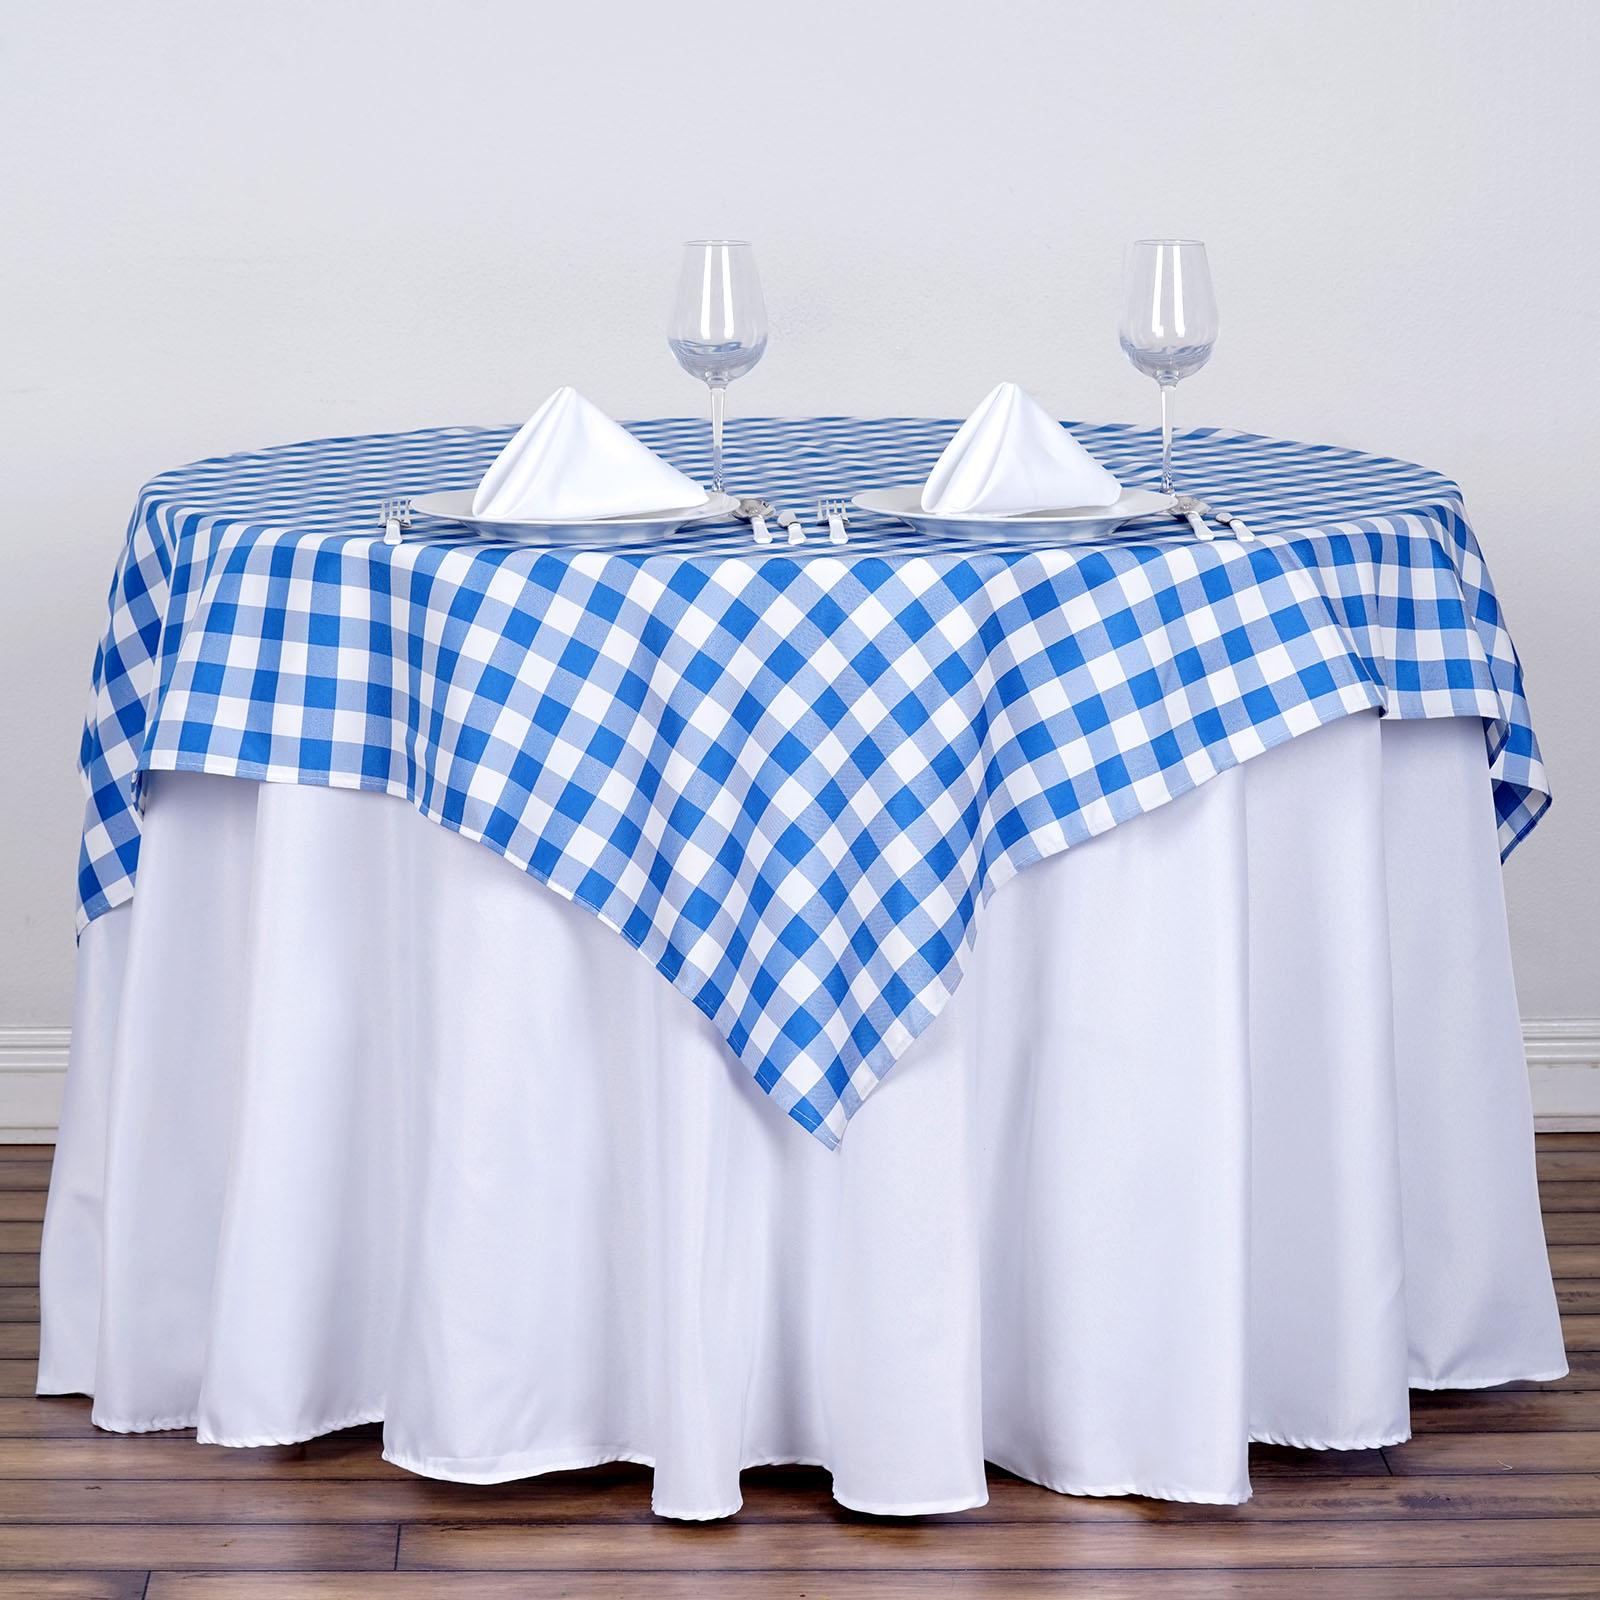 "BalsaCircle 54"" x 54"" Square Gingham Checkered Polyester Tablecloth for Garden... by BalsaCircle"